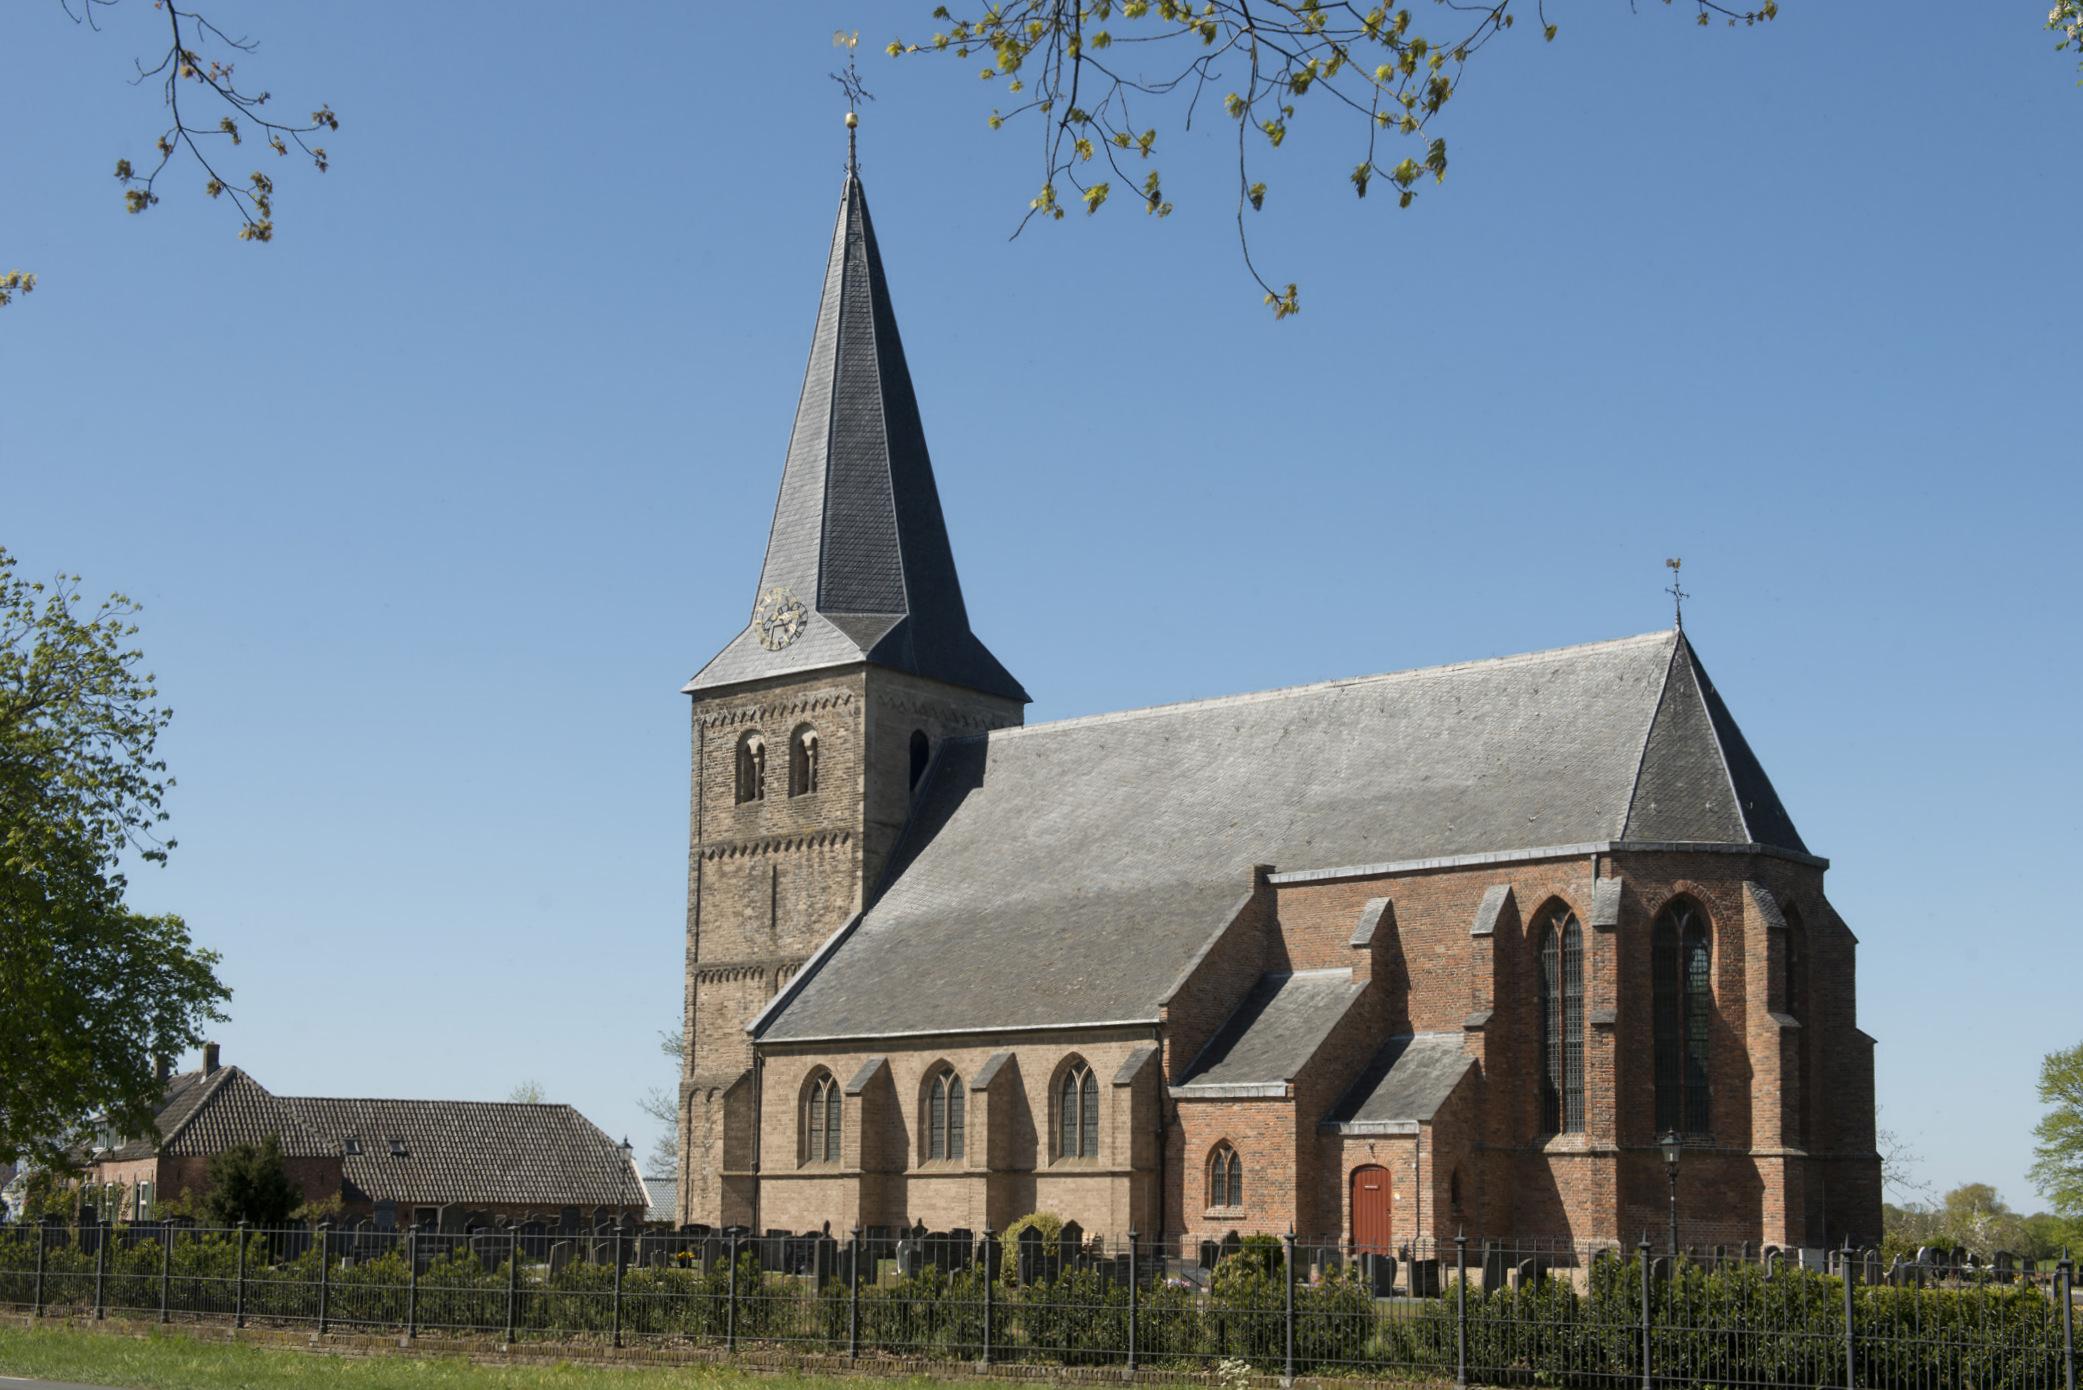 Kerkstraat 1 Drempt St. Joriskerk